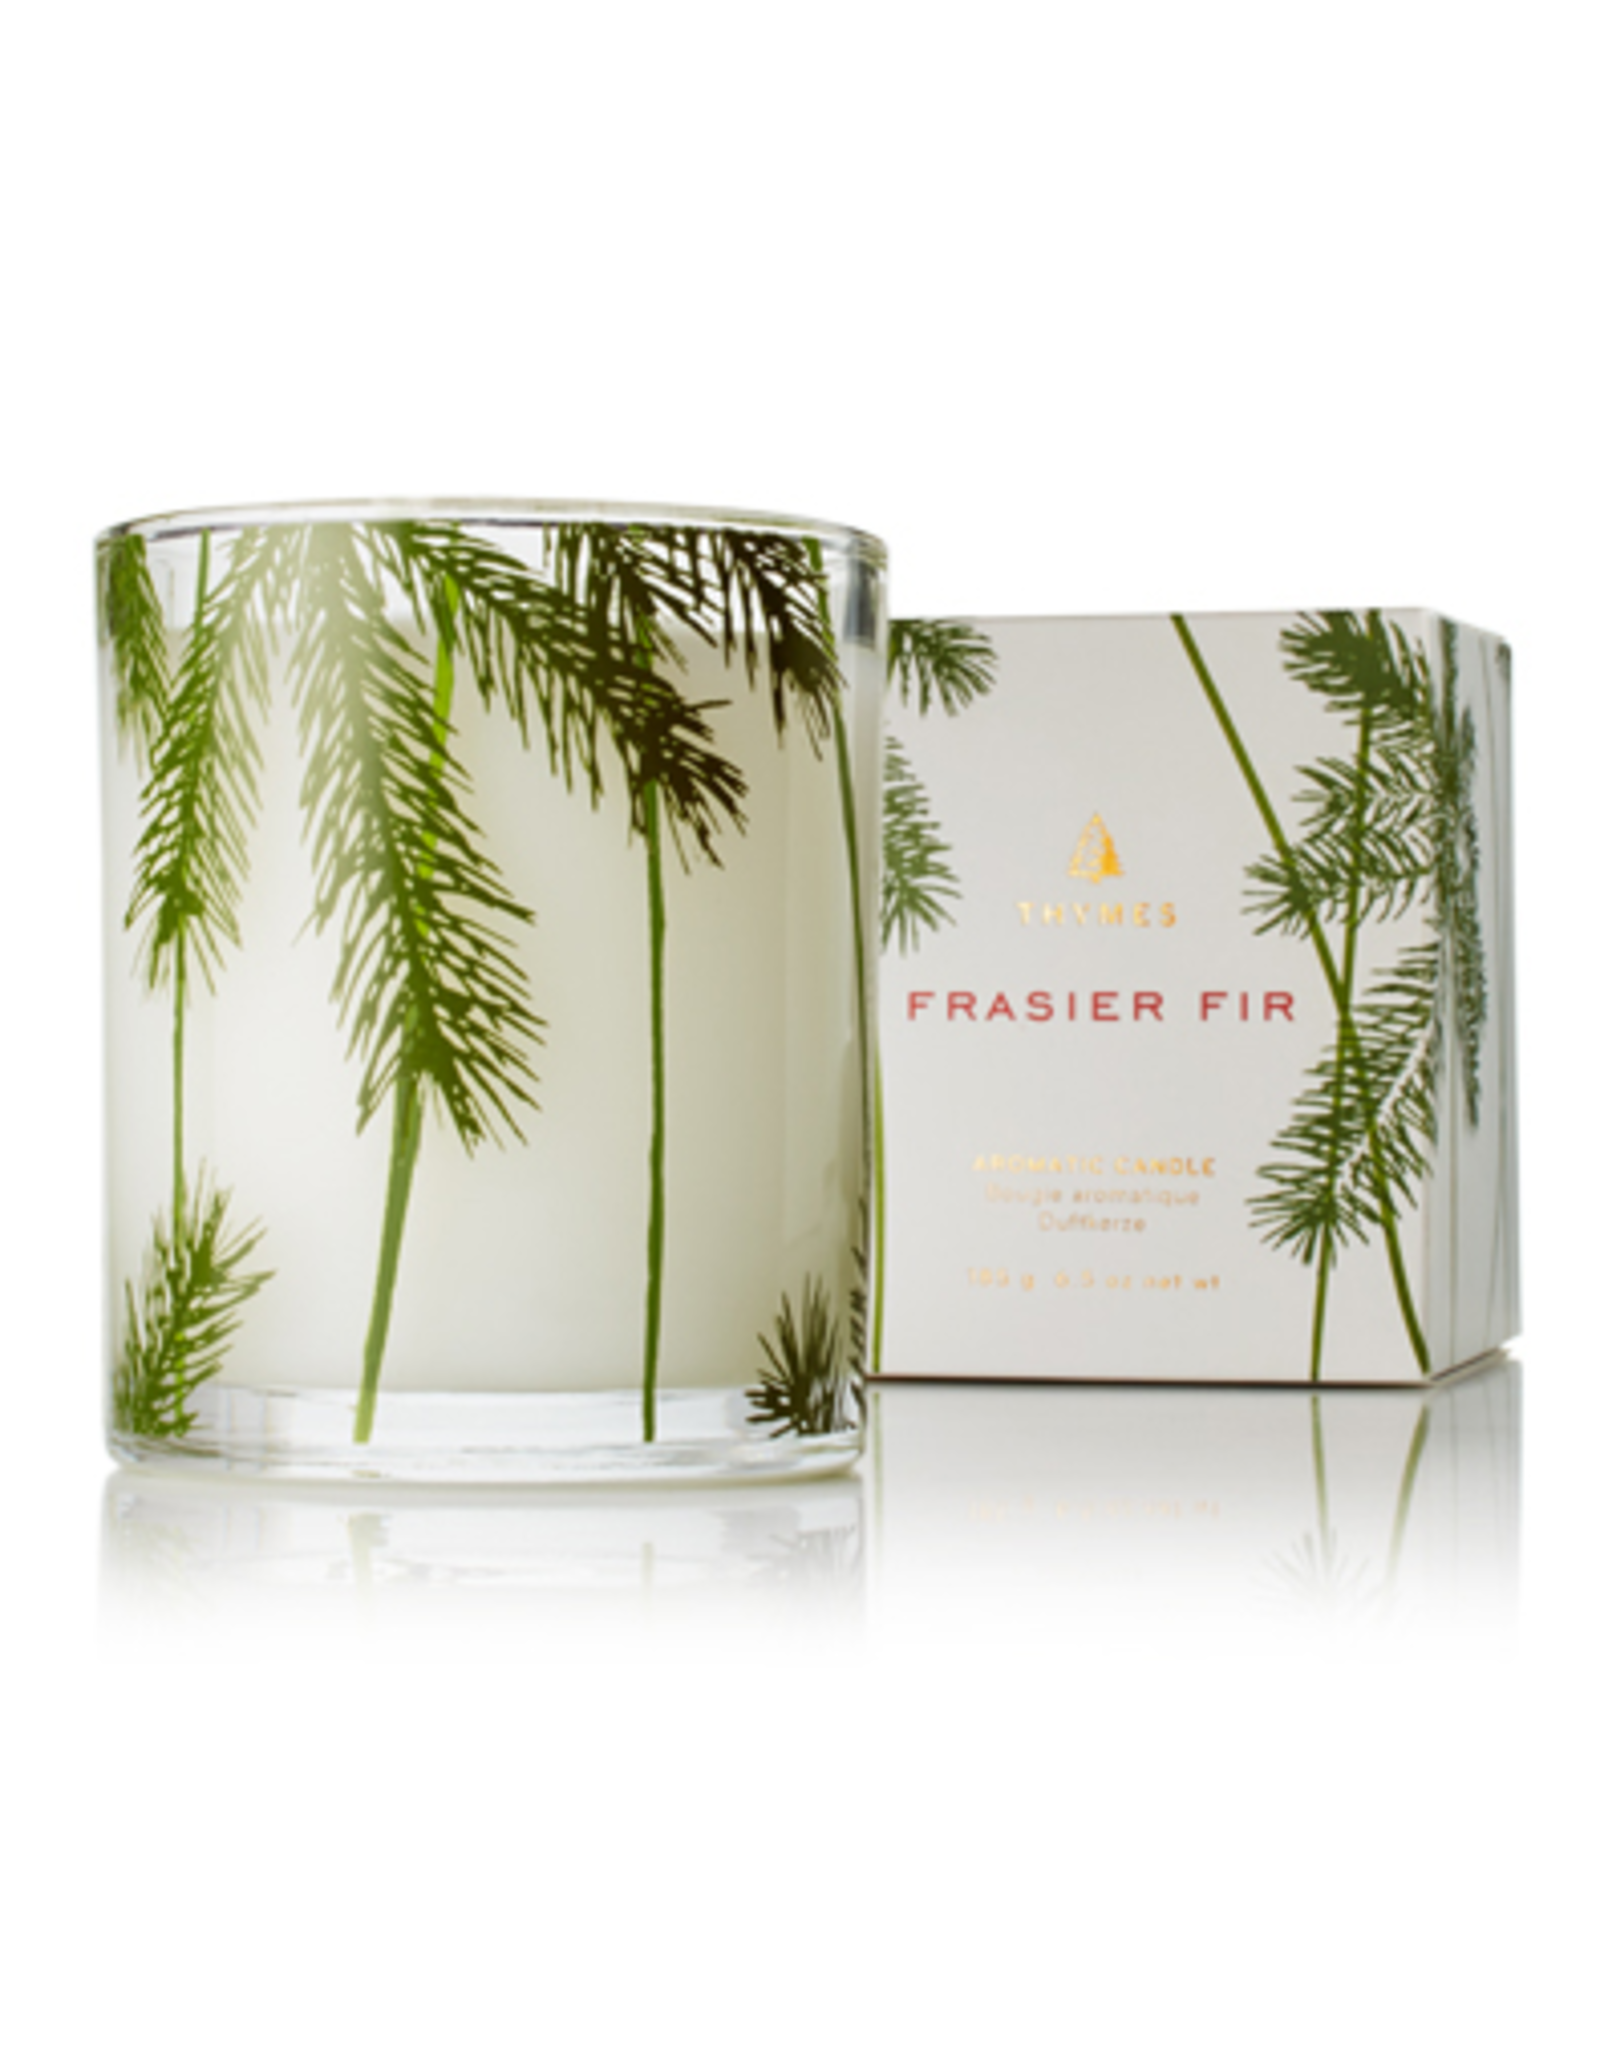 Thymes Frasier Fir Candle 6.5 oz